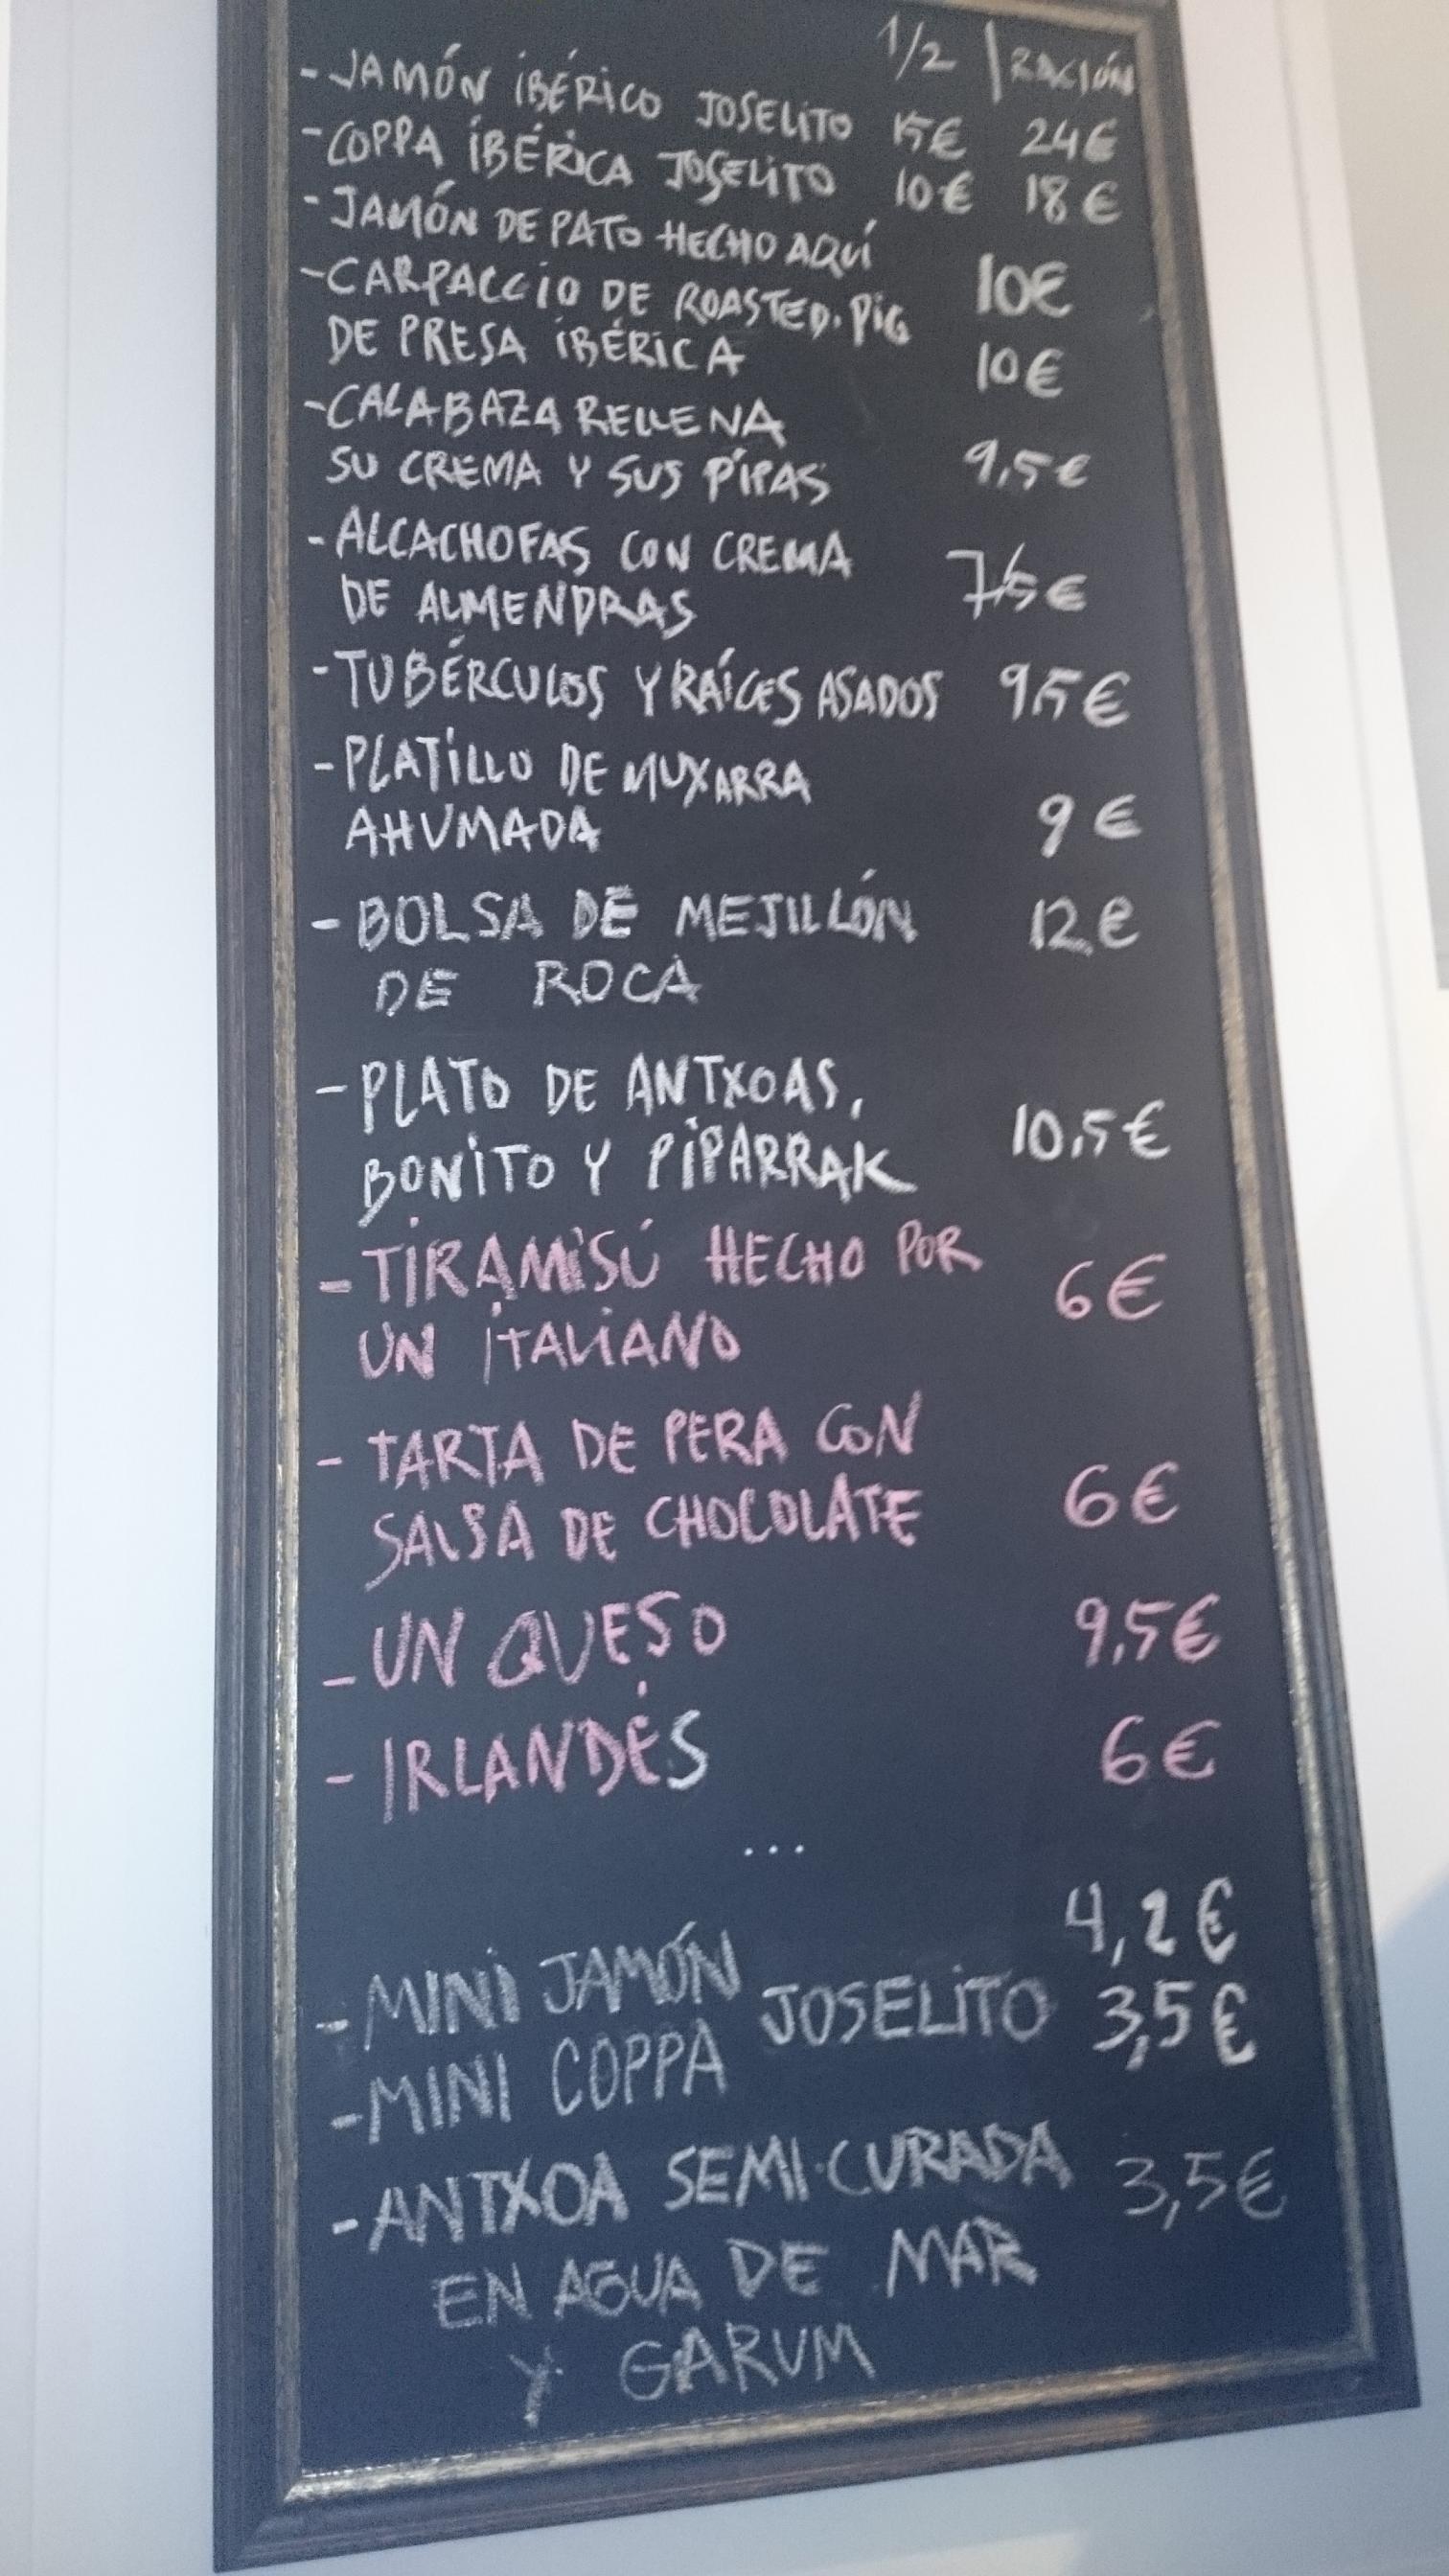 Restaurante Bar Matalauva.